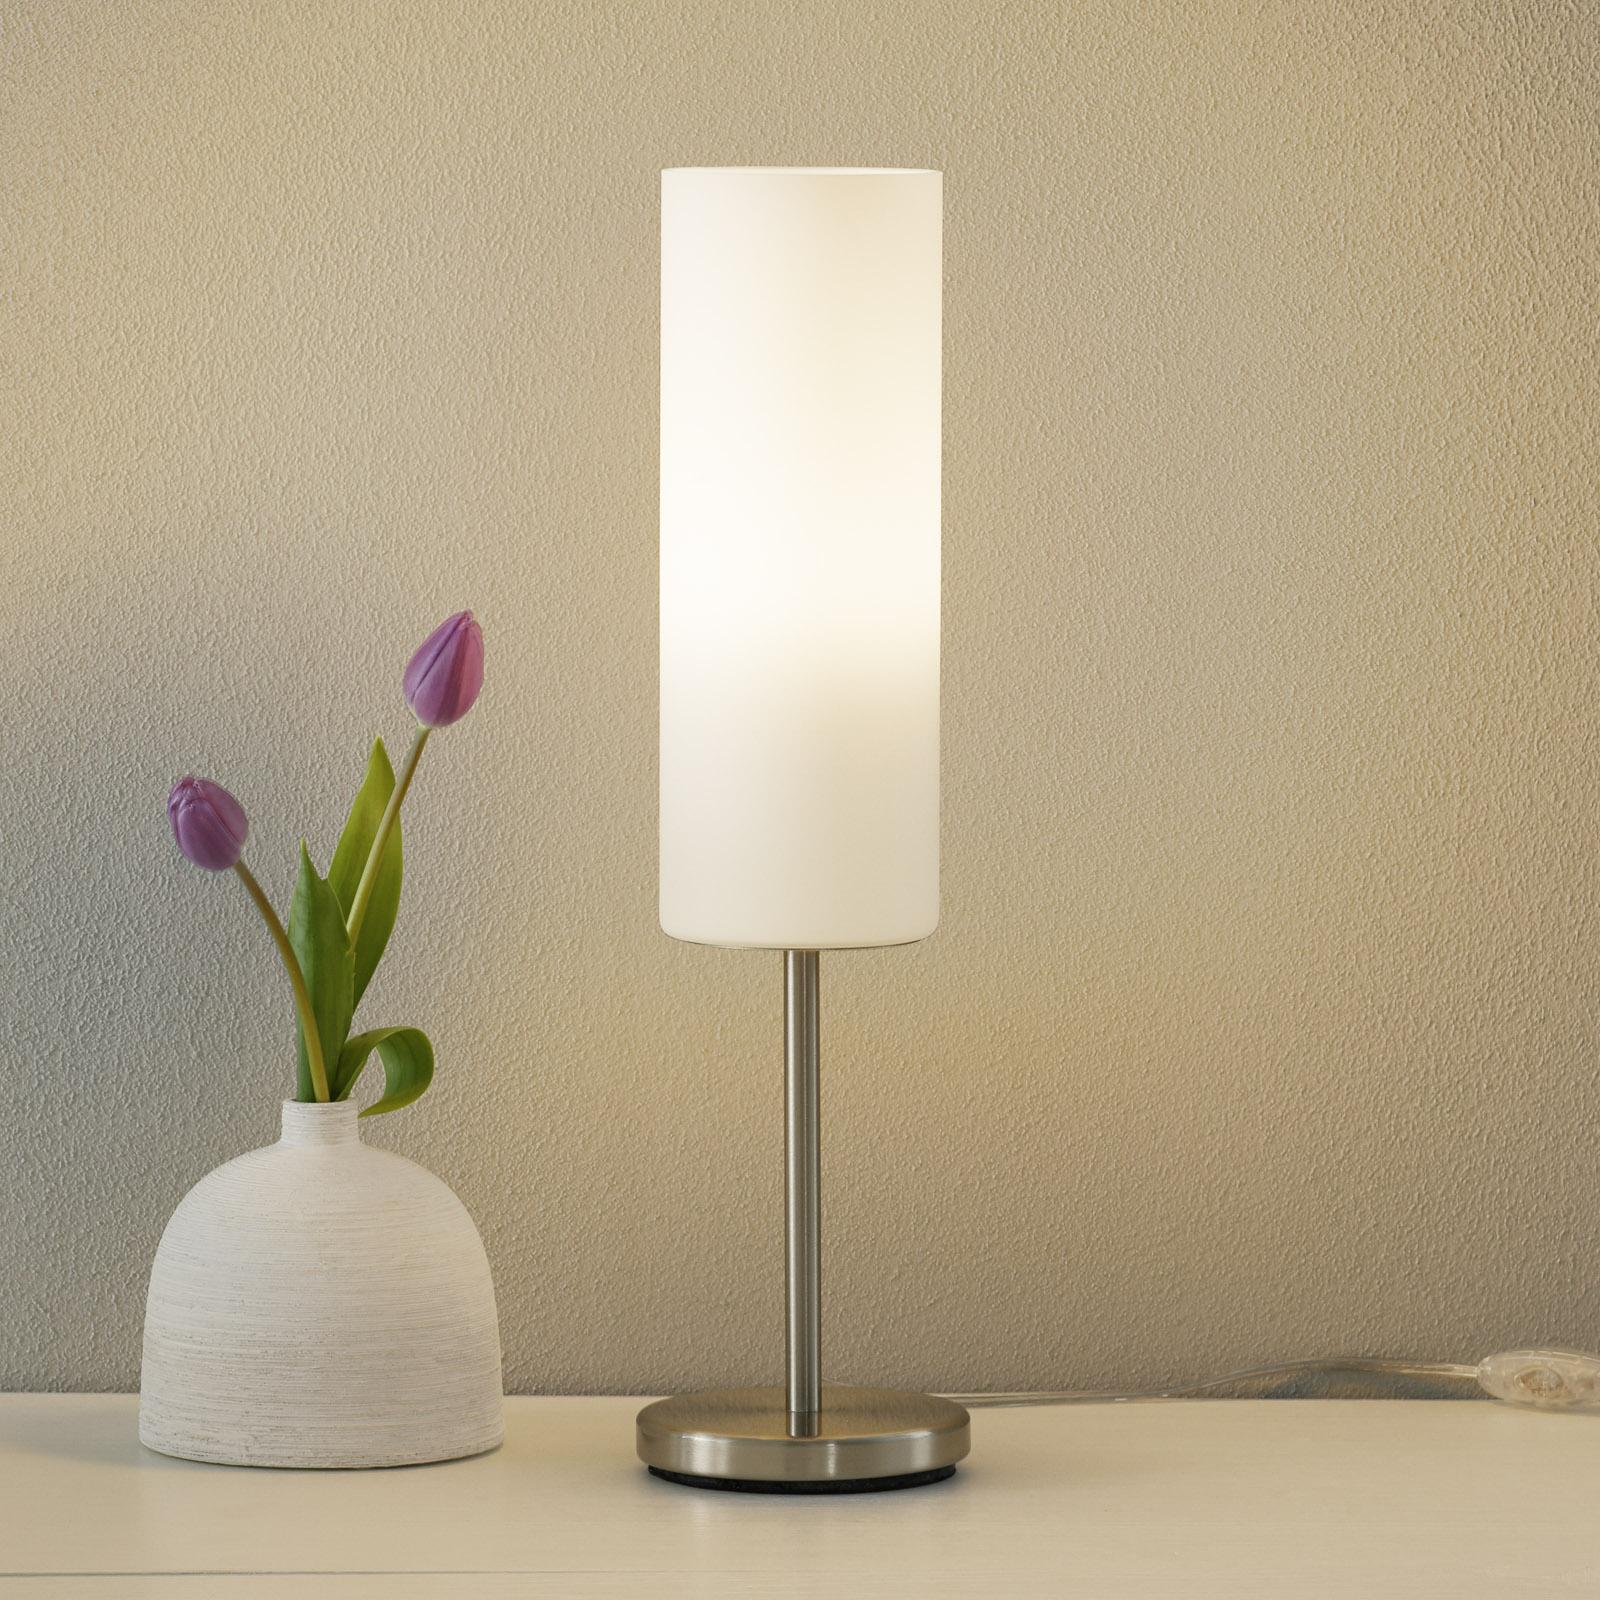 Affascinante lampada da tavolo bianca TROY